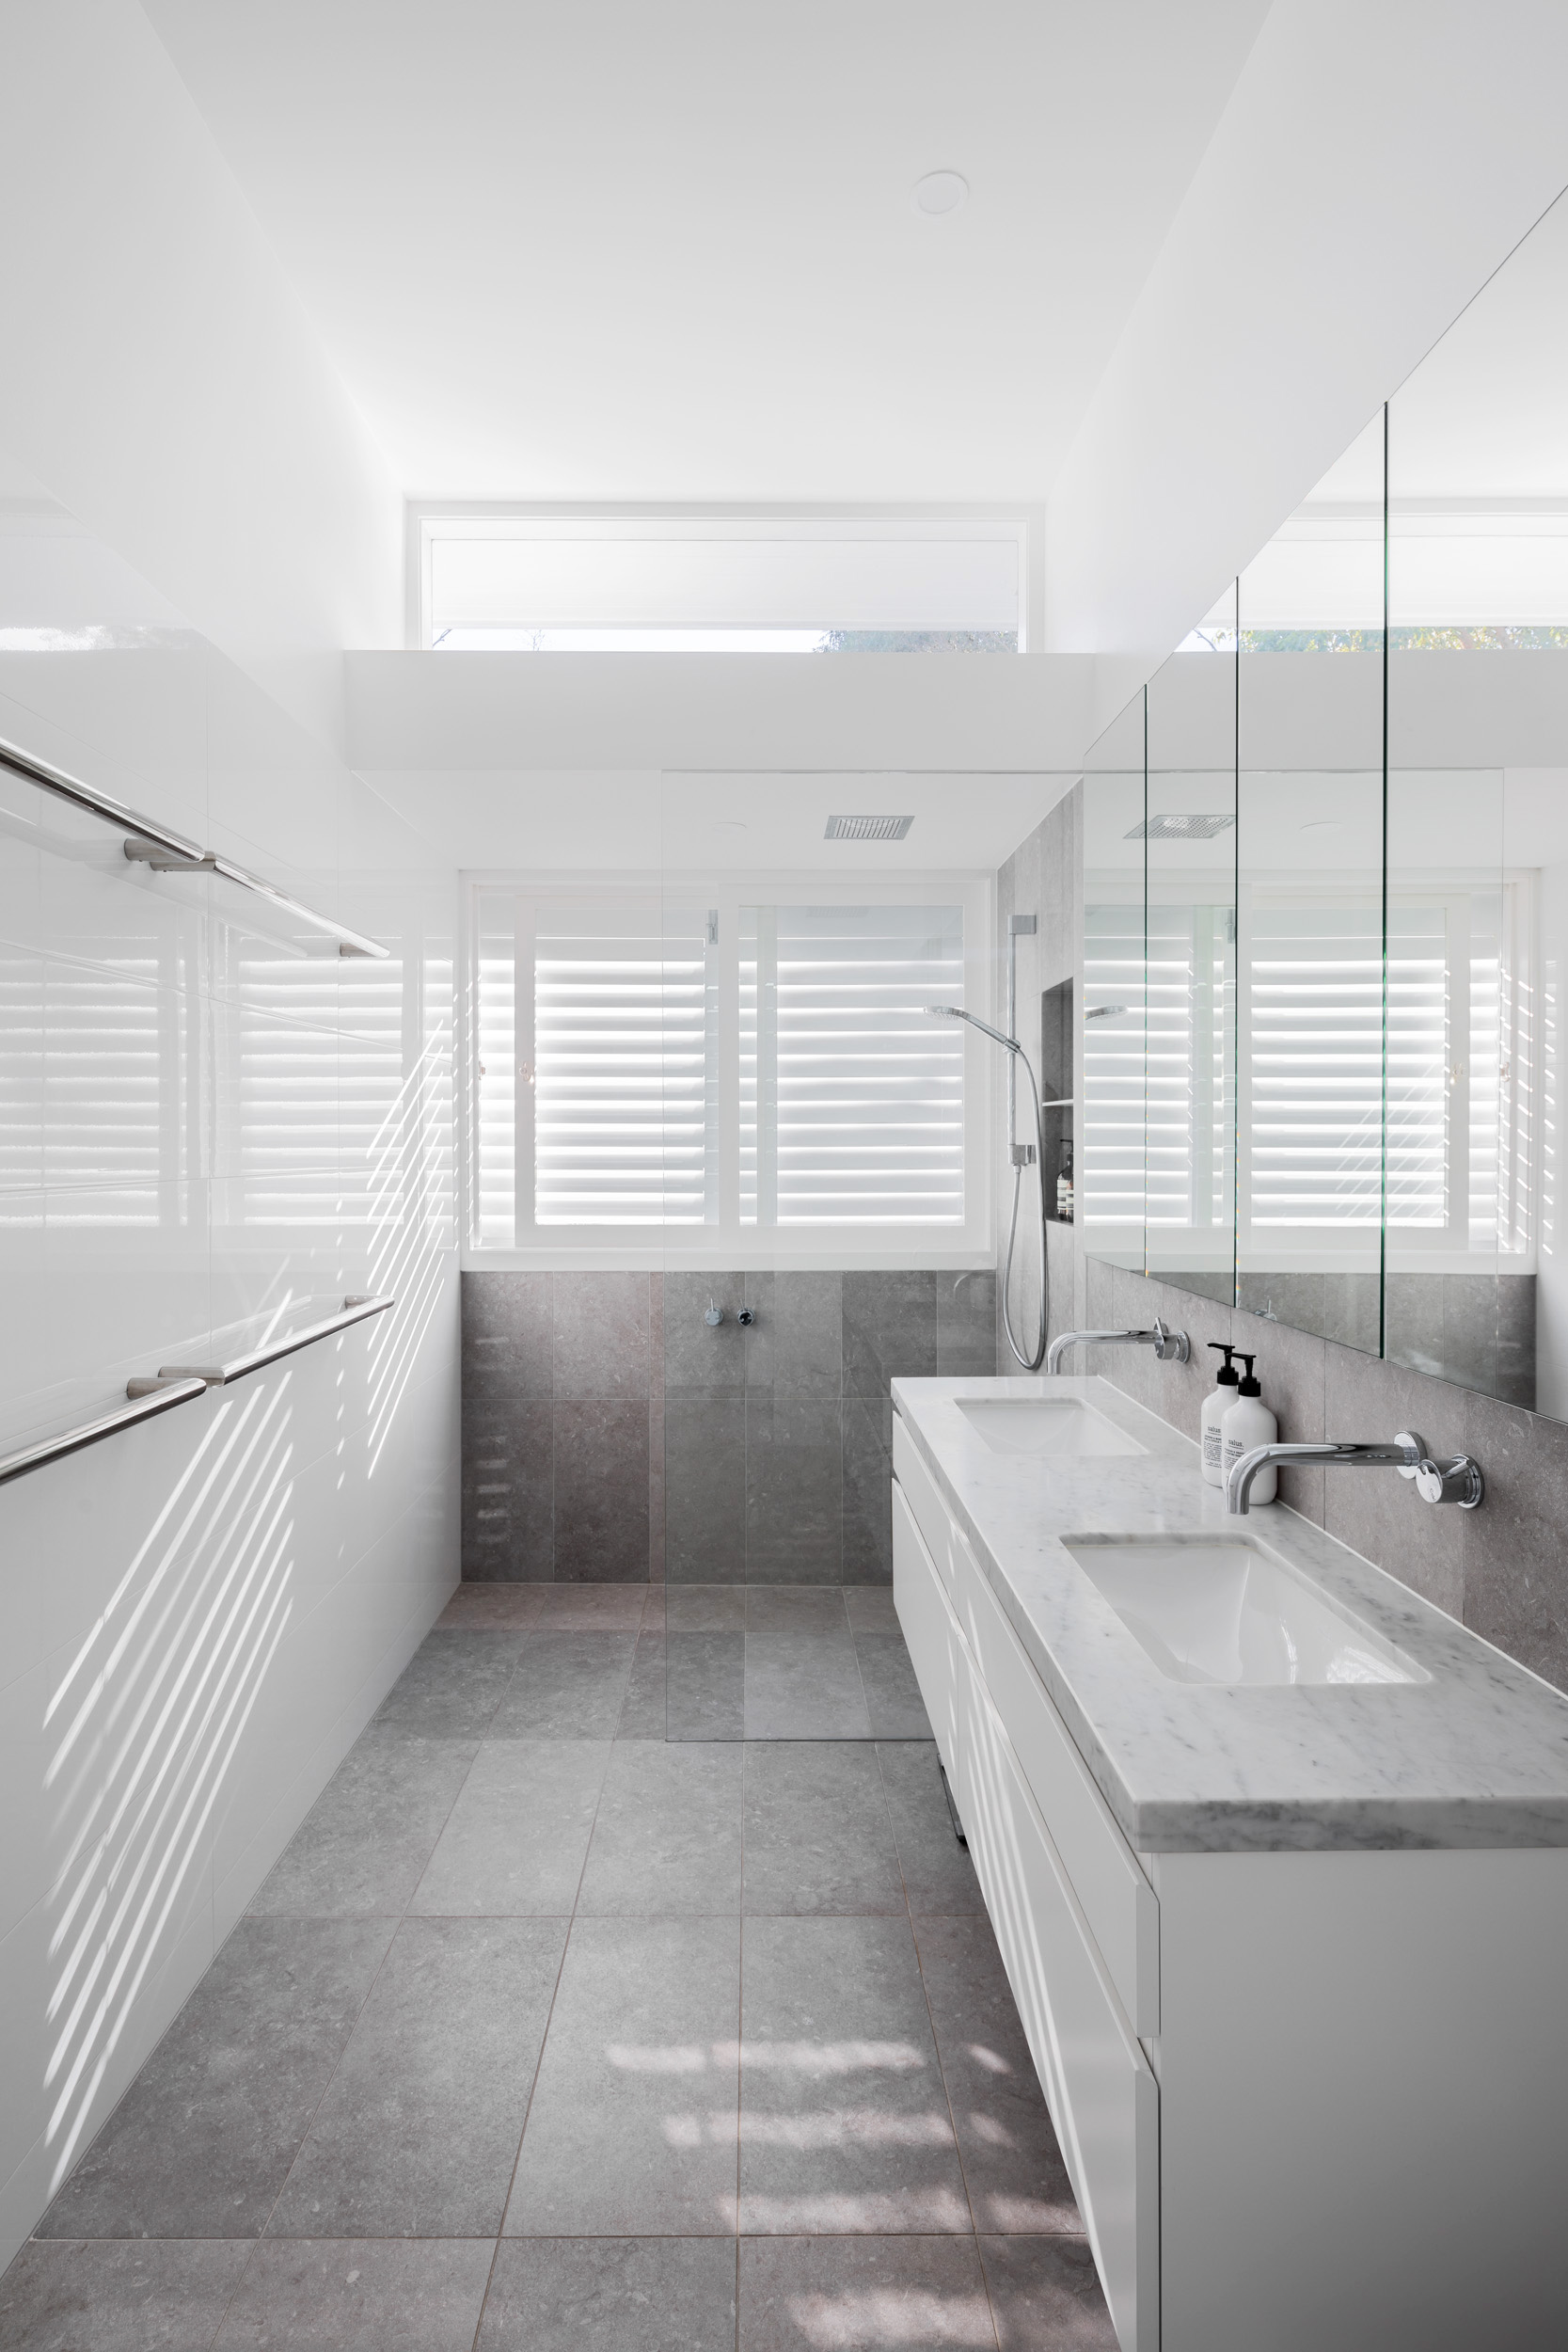 Jem_Cresswell_Architecture_Residential_Photographer_Sydney_Australia_016.jpg